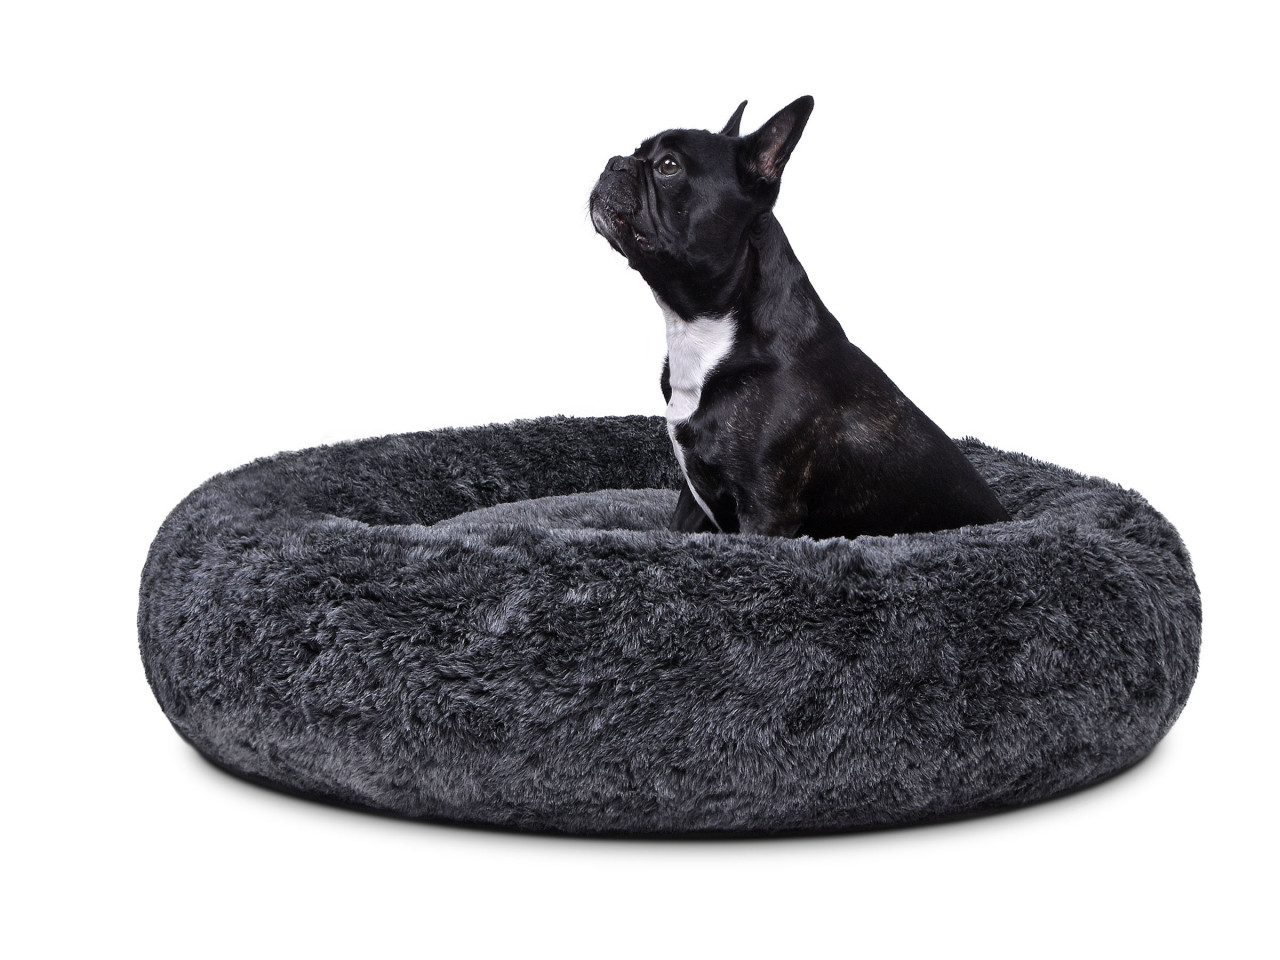 hundebett-COSY BASIC-anthrazit-hund